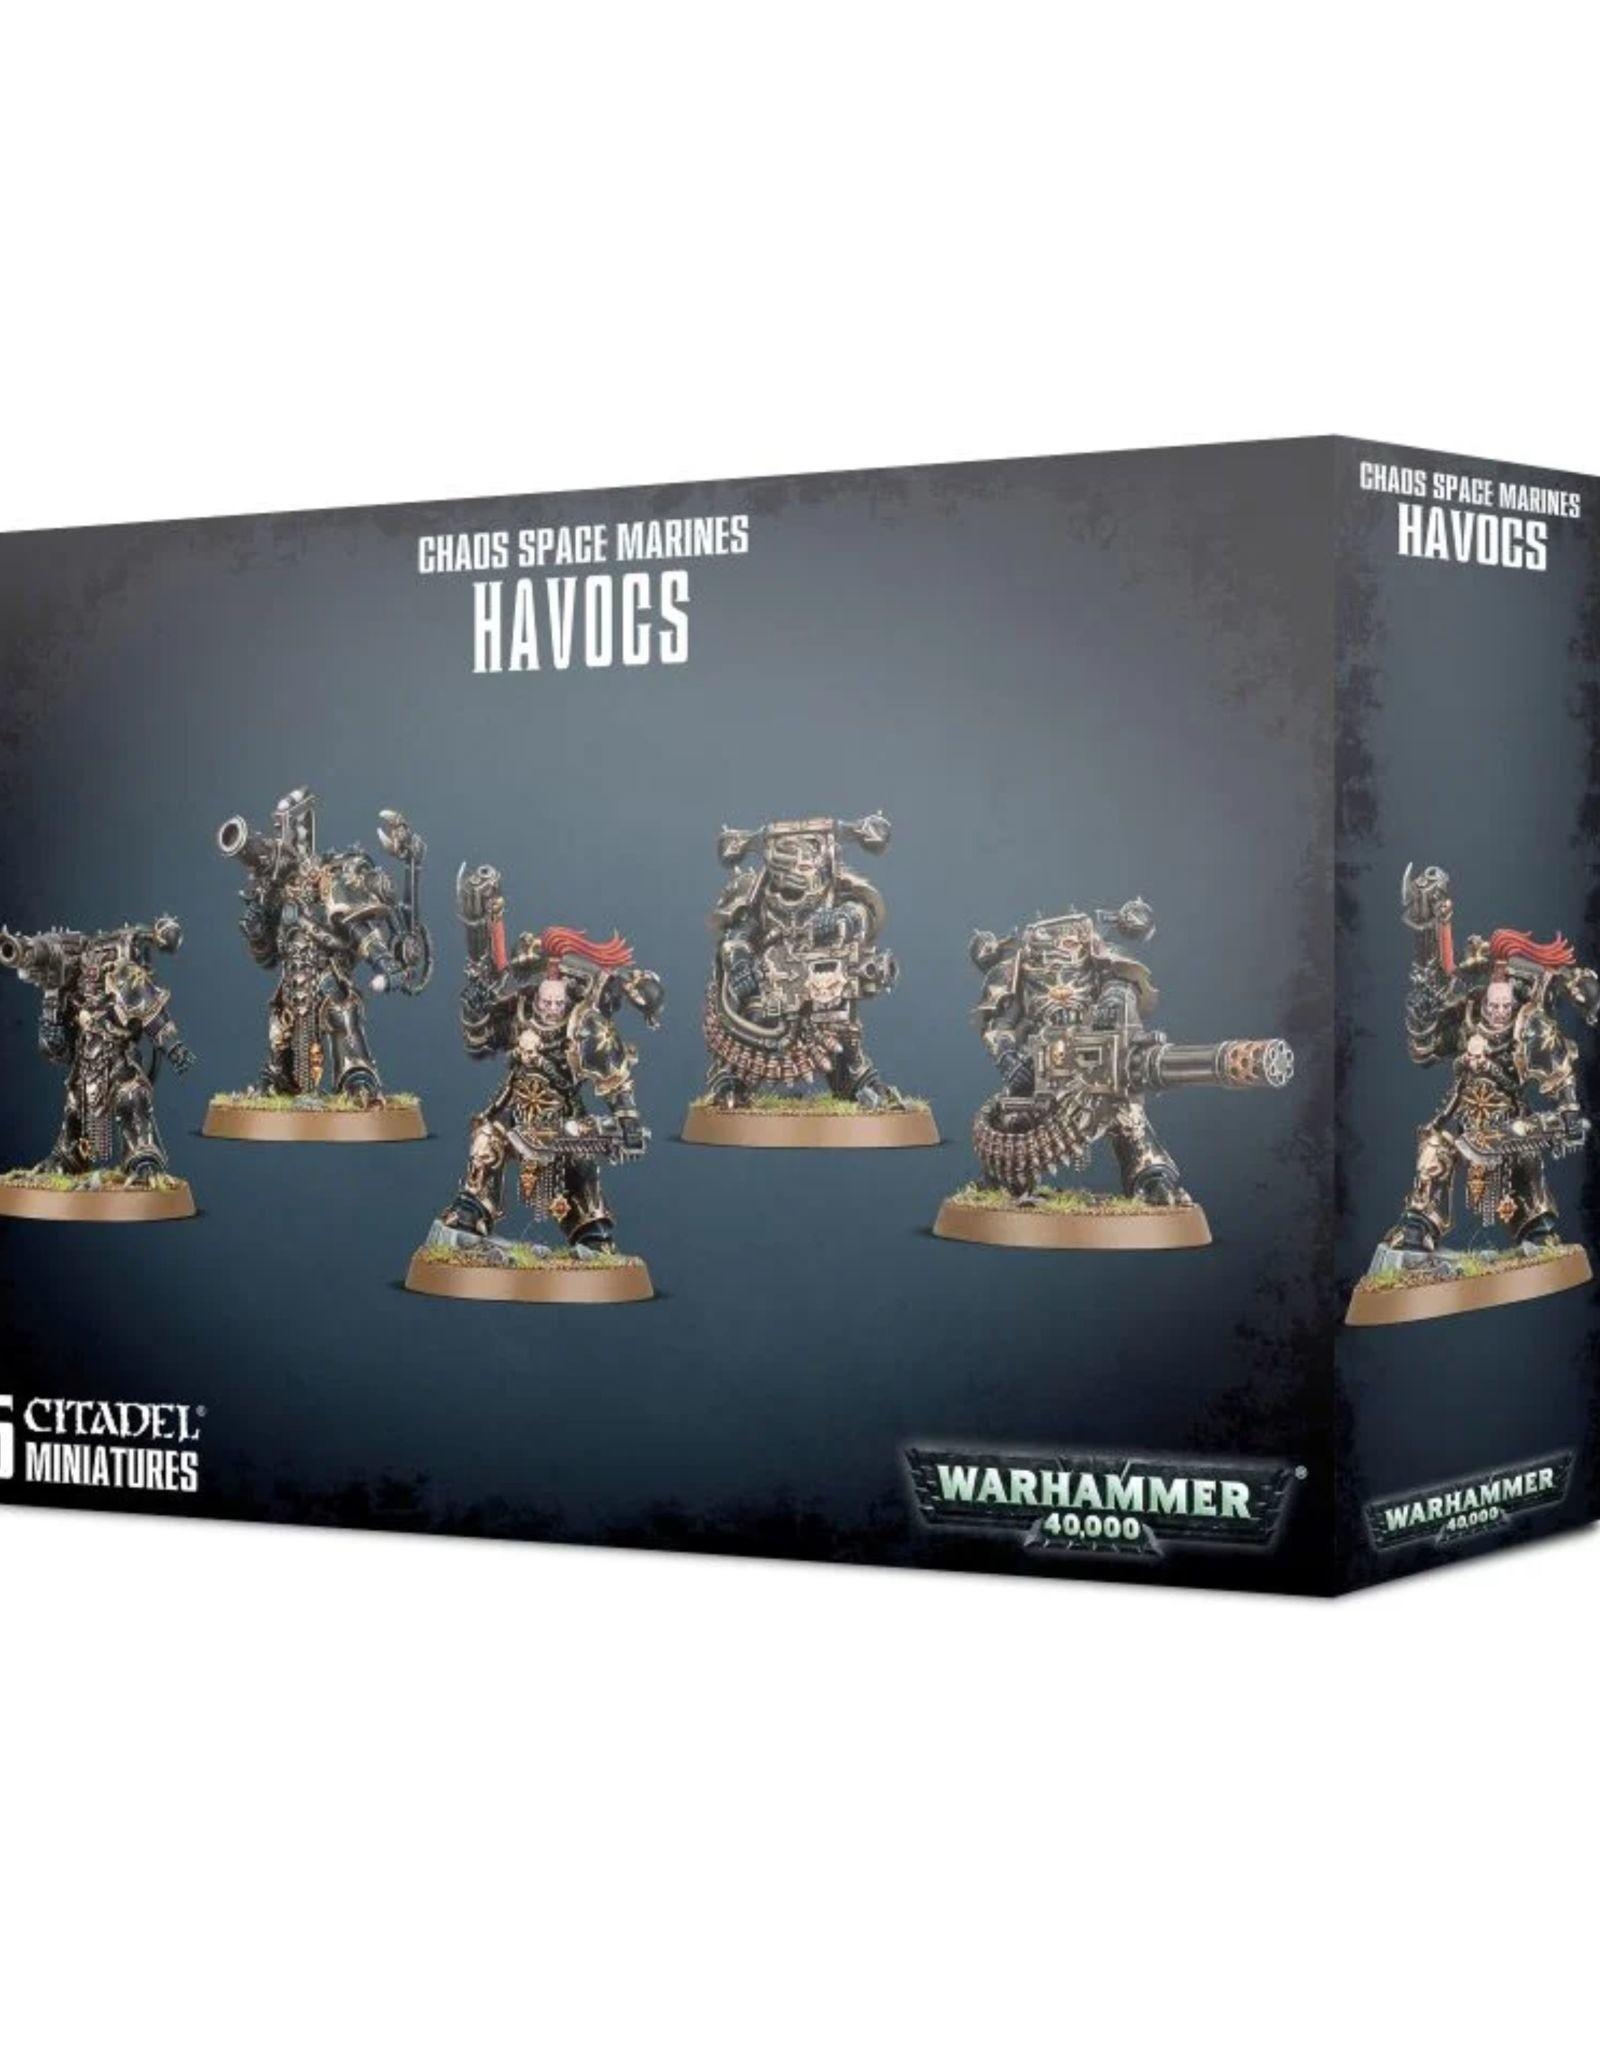 Warhammer 40k Chaos Space Marine Havocs